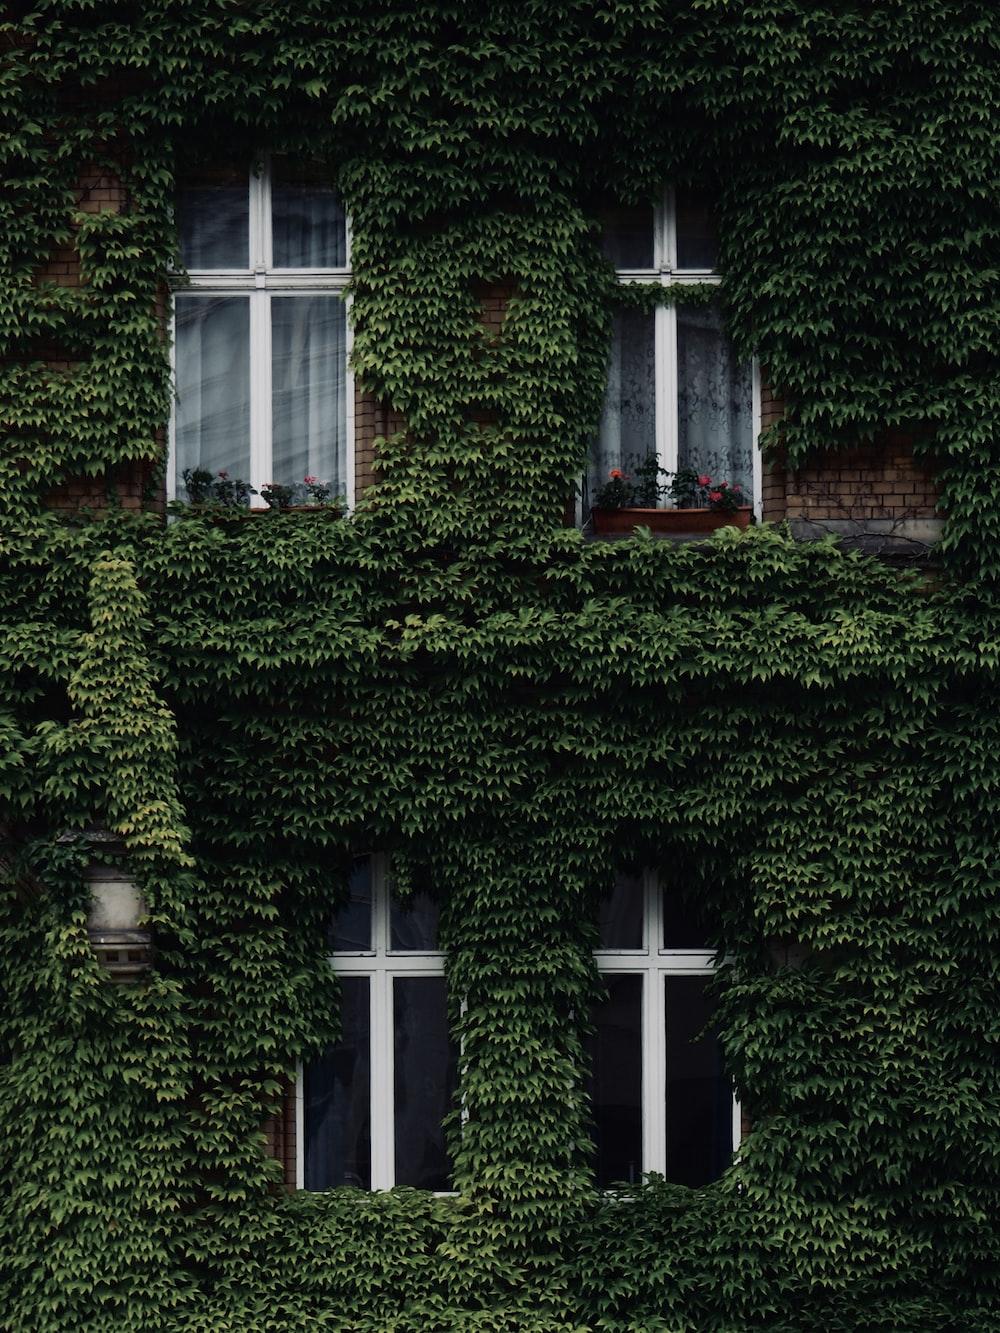 green vines on house wall near windows